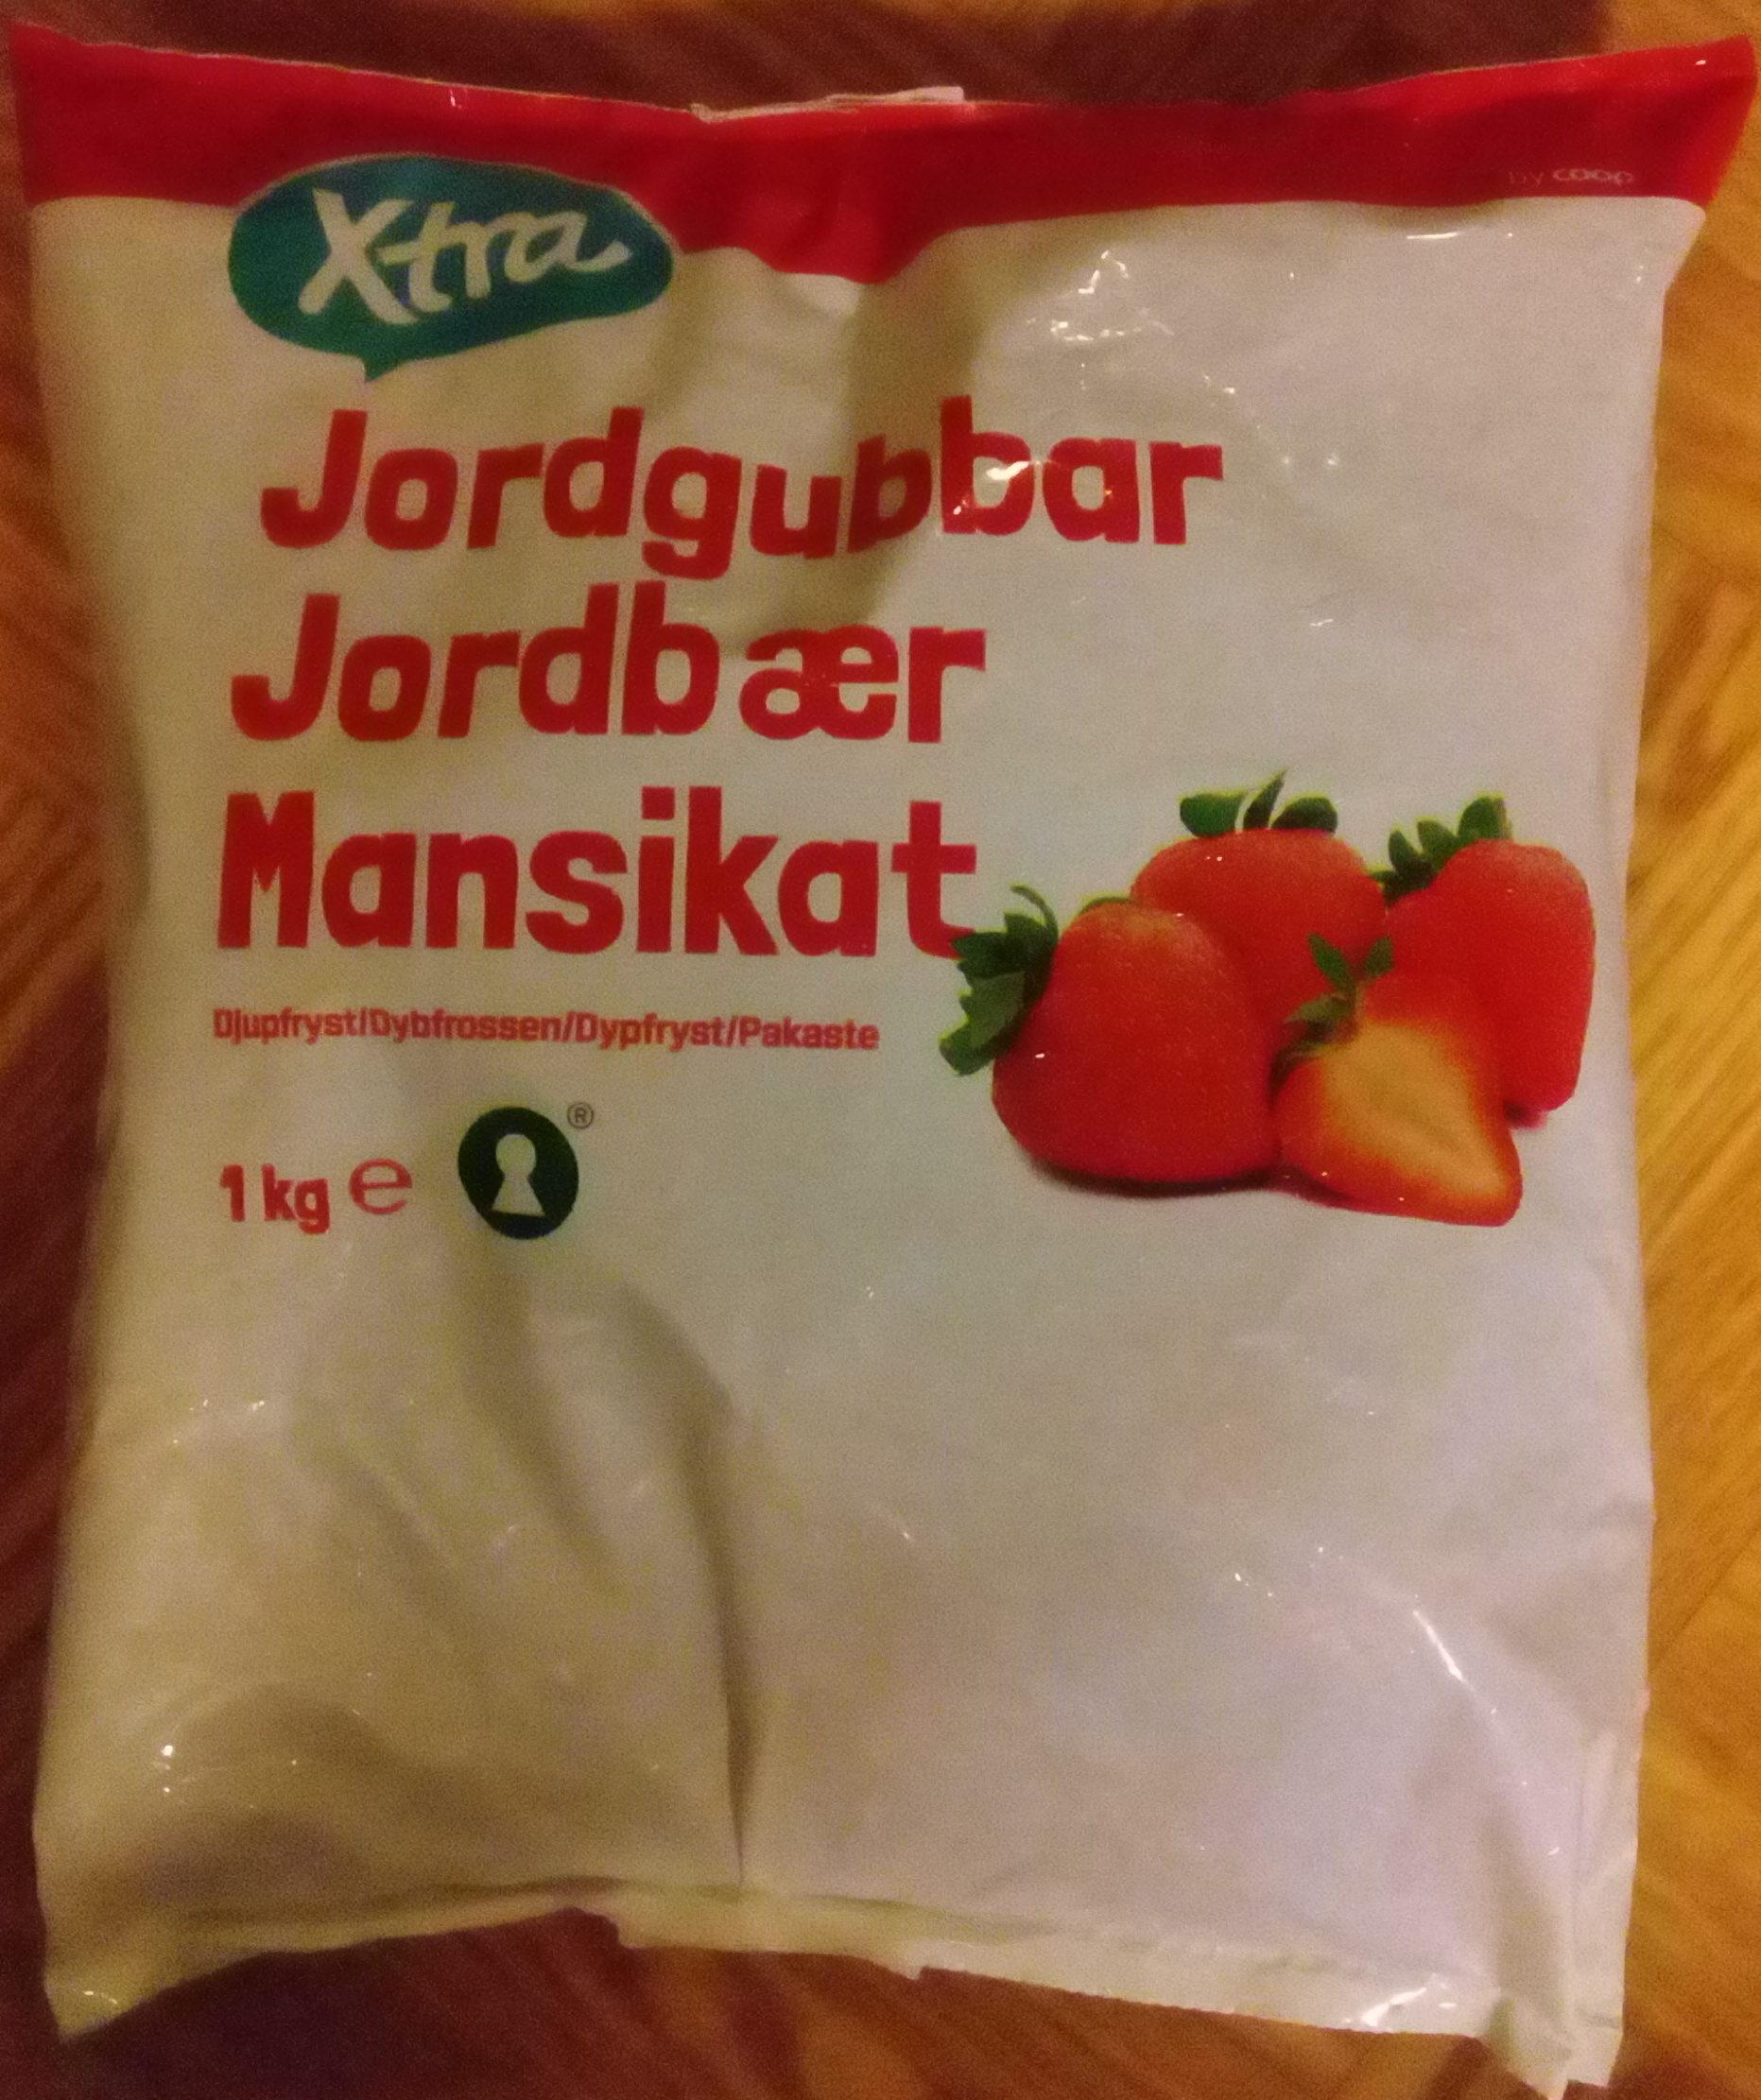 Coop X-tra Jordgubbar - Produit - sv